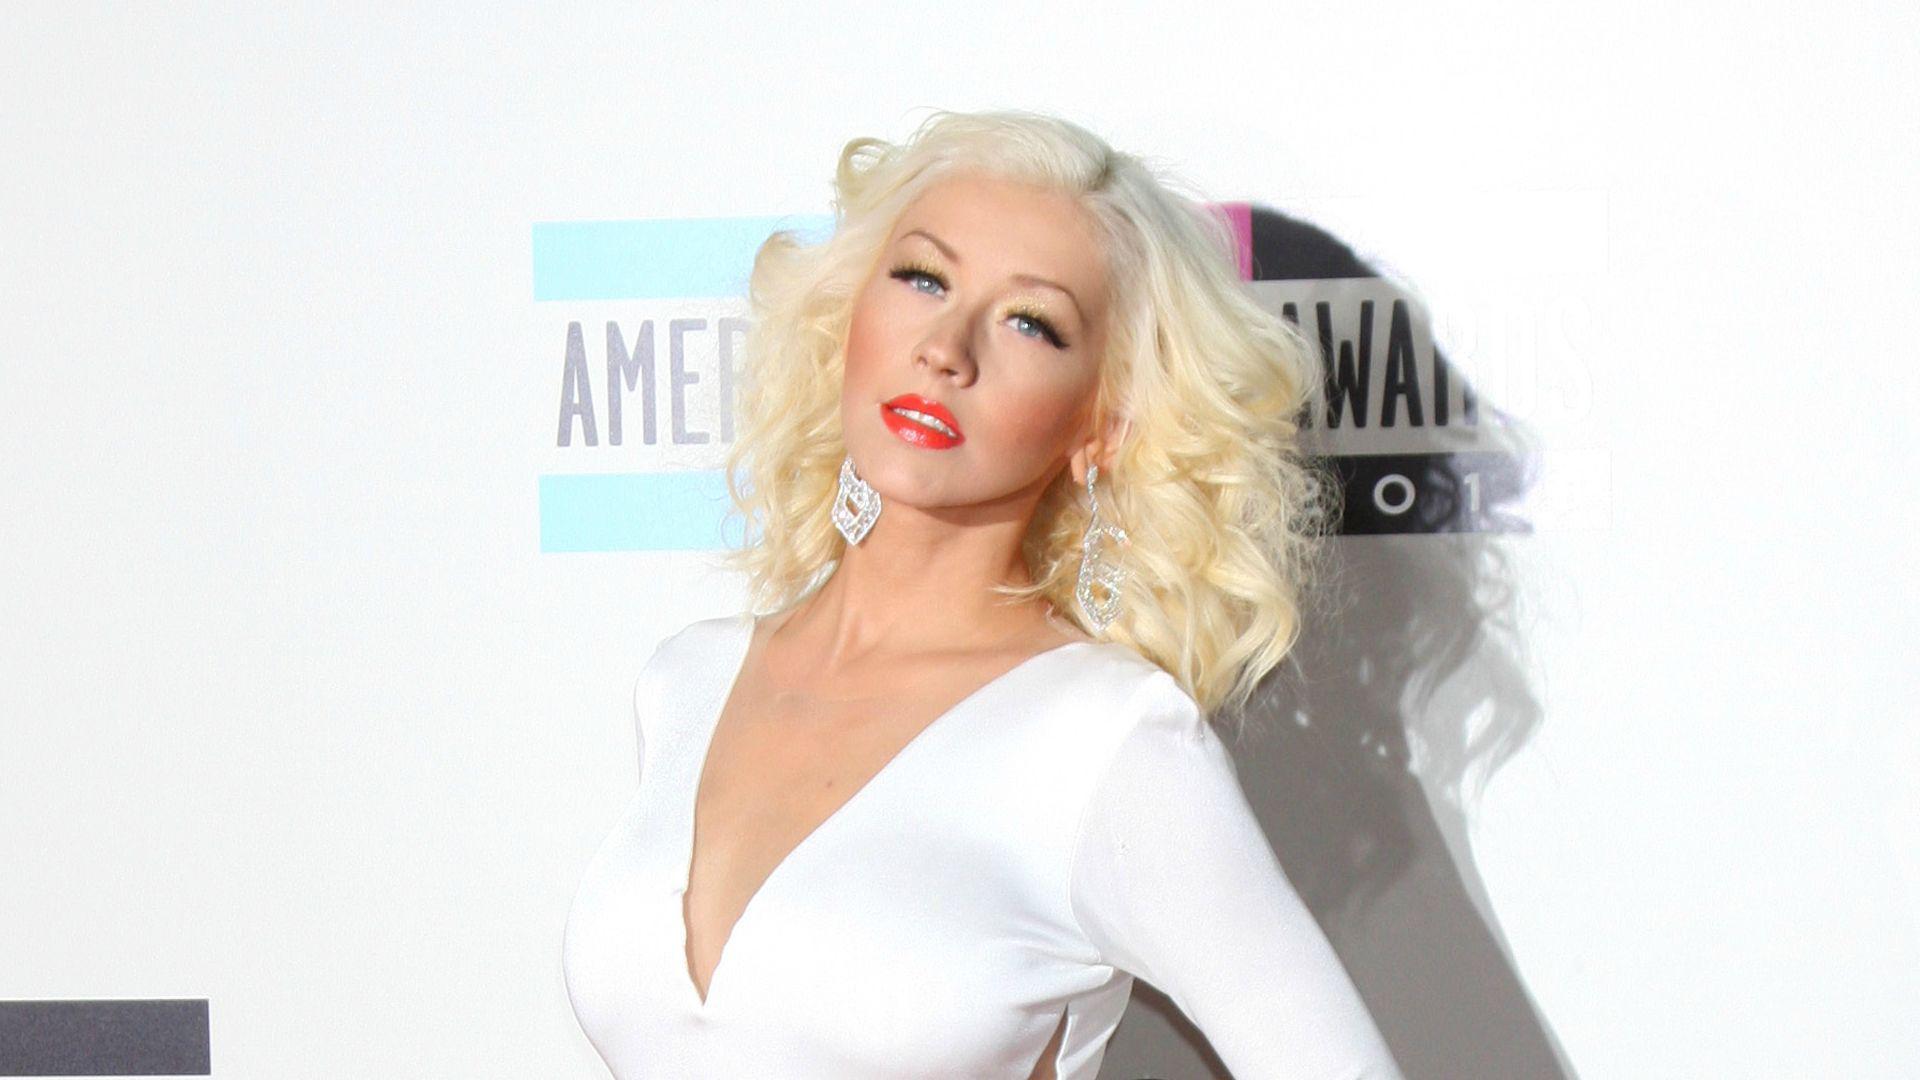 Tits Celebrity Christina Aguilera naked photo 2017